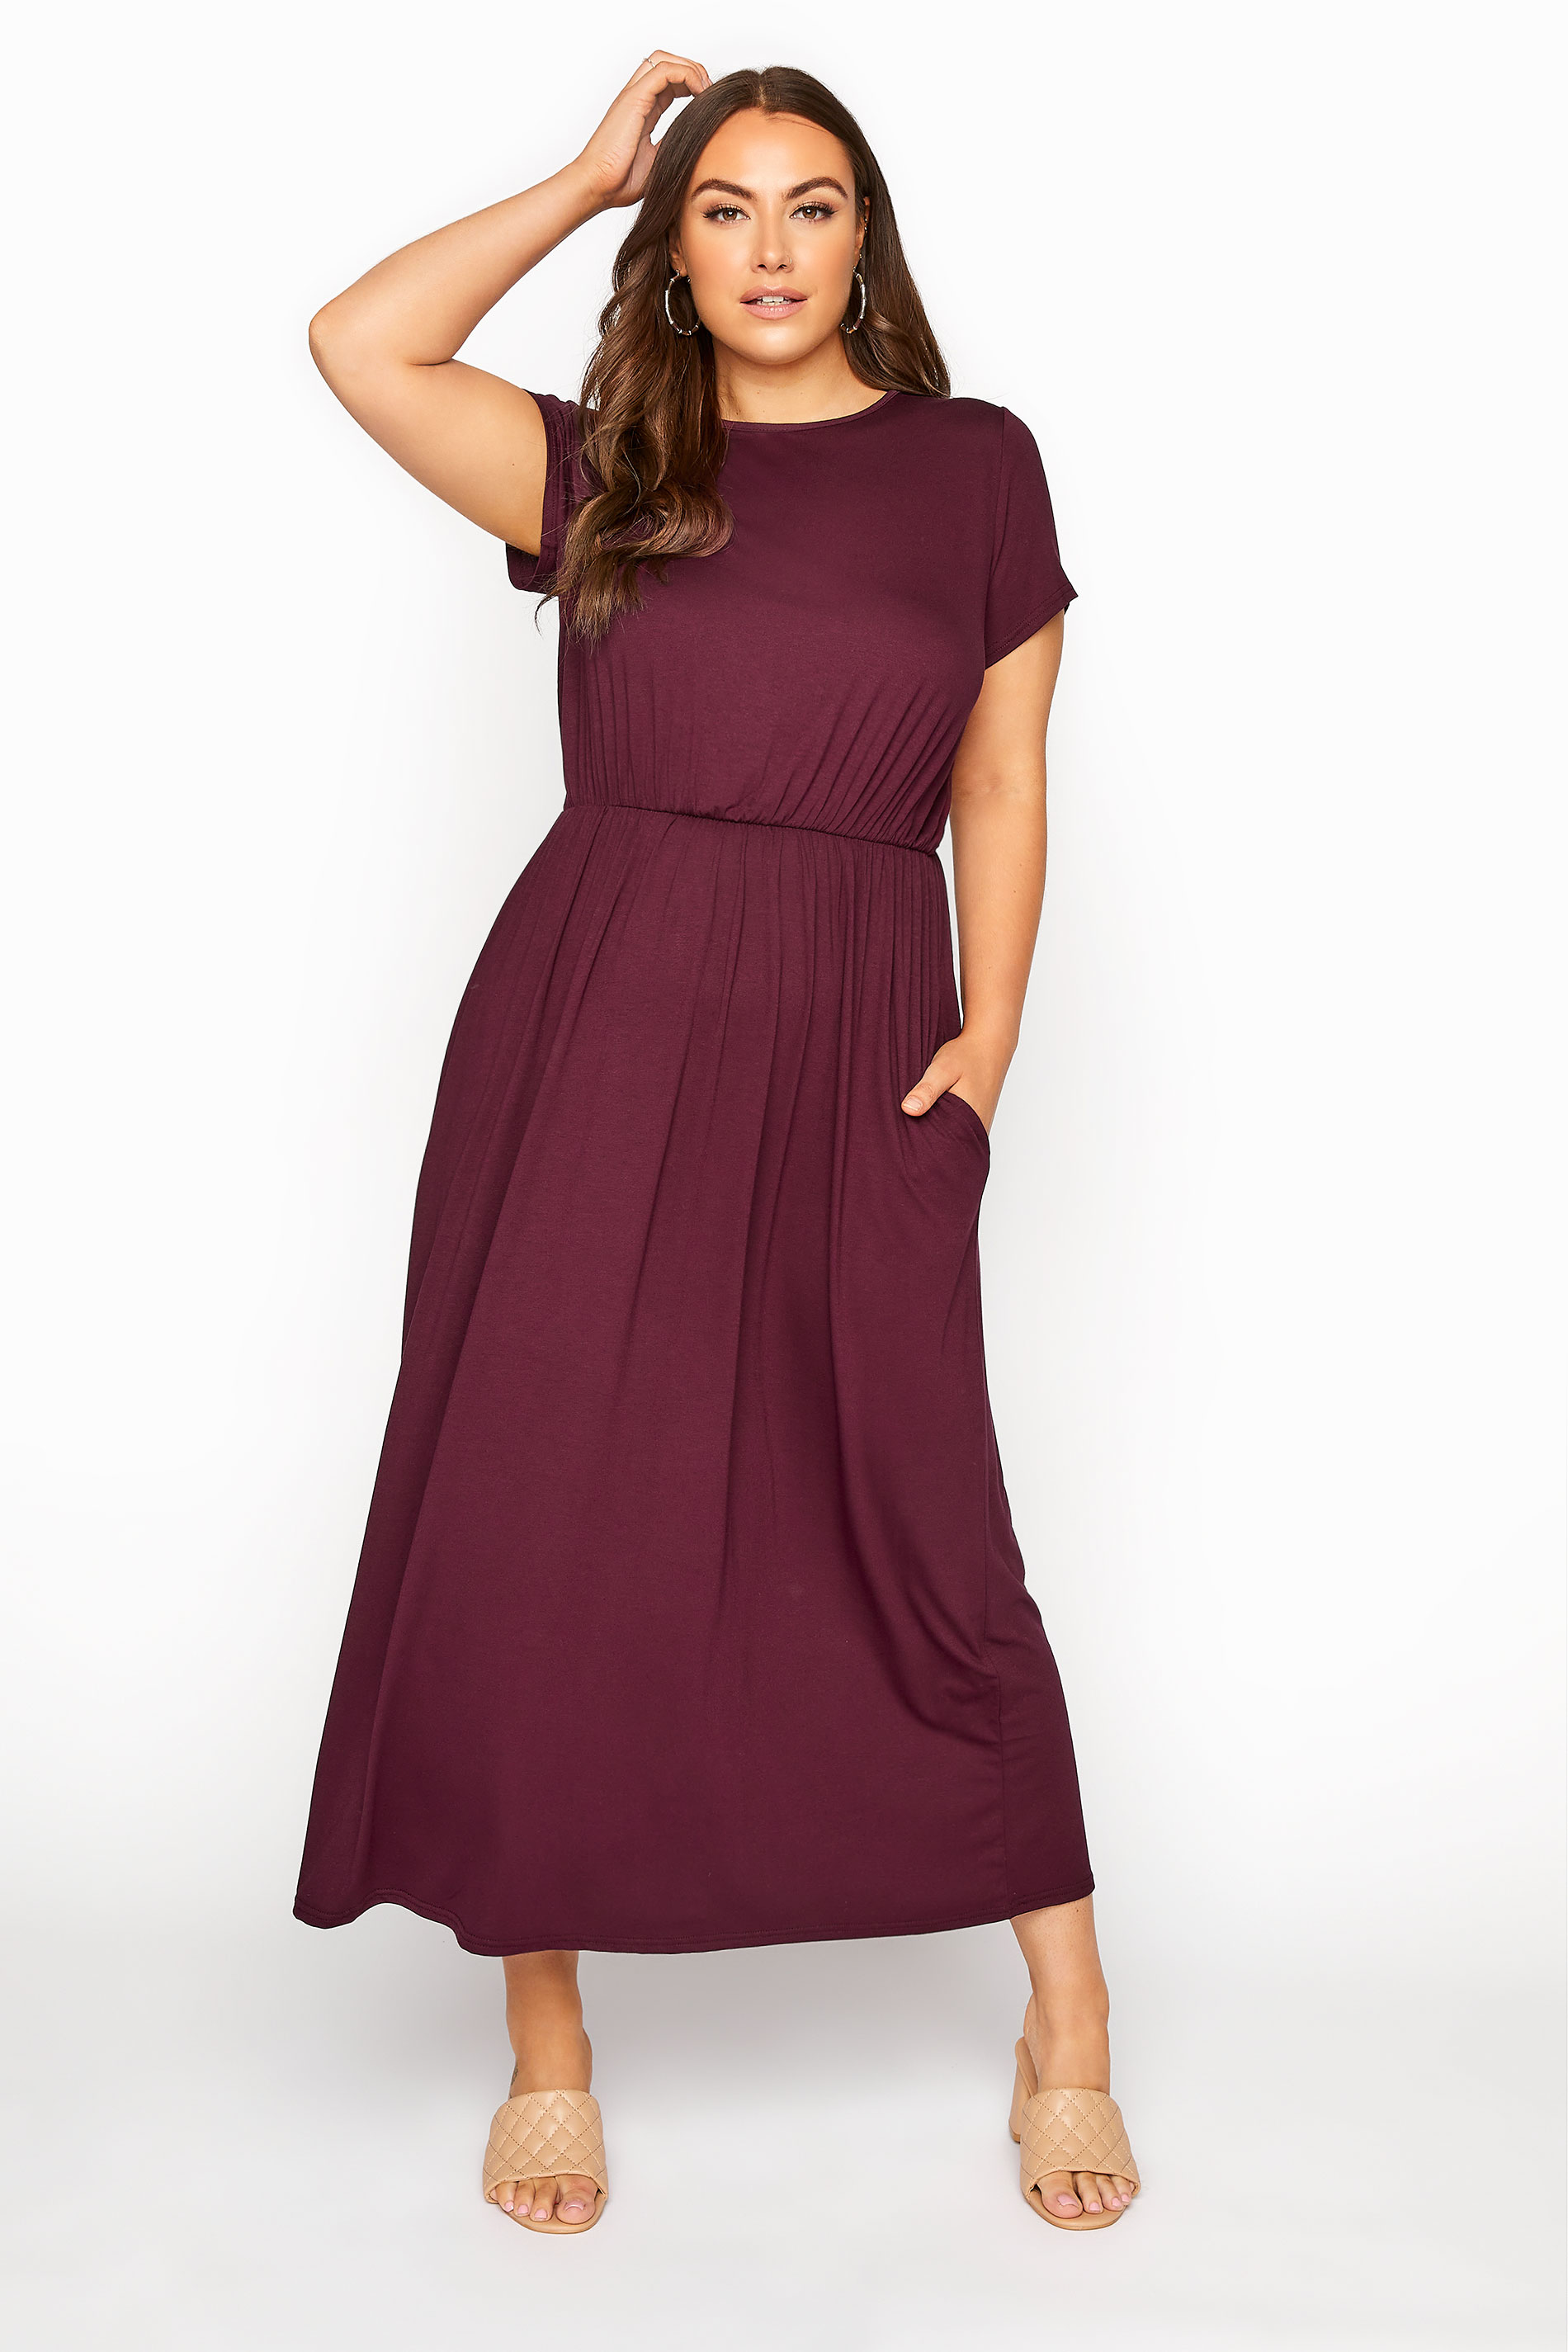 YOURS LONDON Burgundy Pocket Maxi Dress_A.jpg